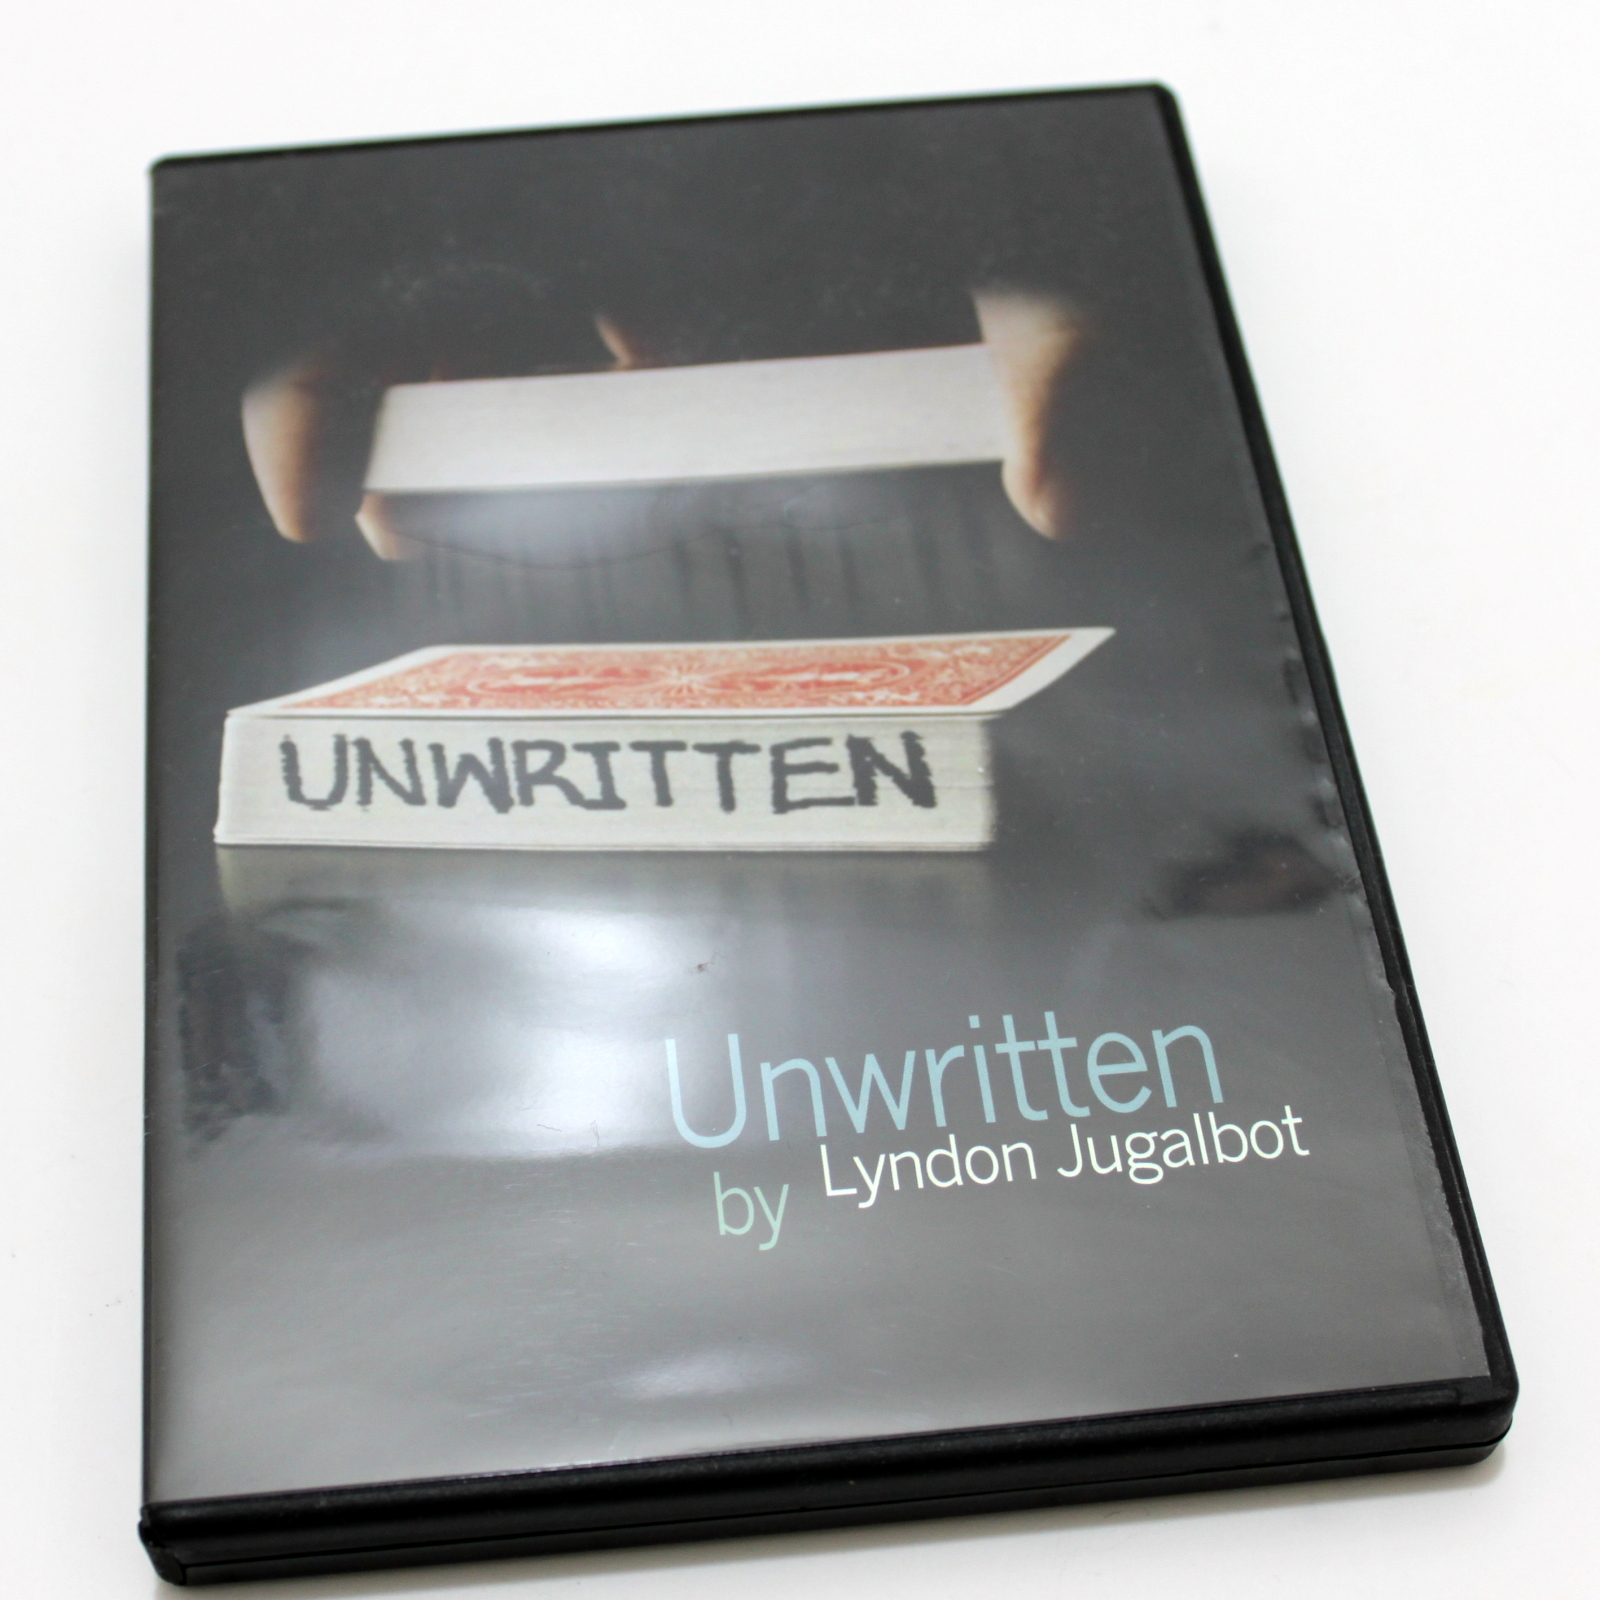 Unwritten, Red by Lyndon Jugalbot